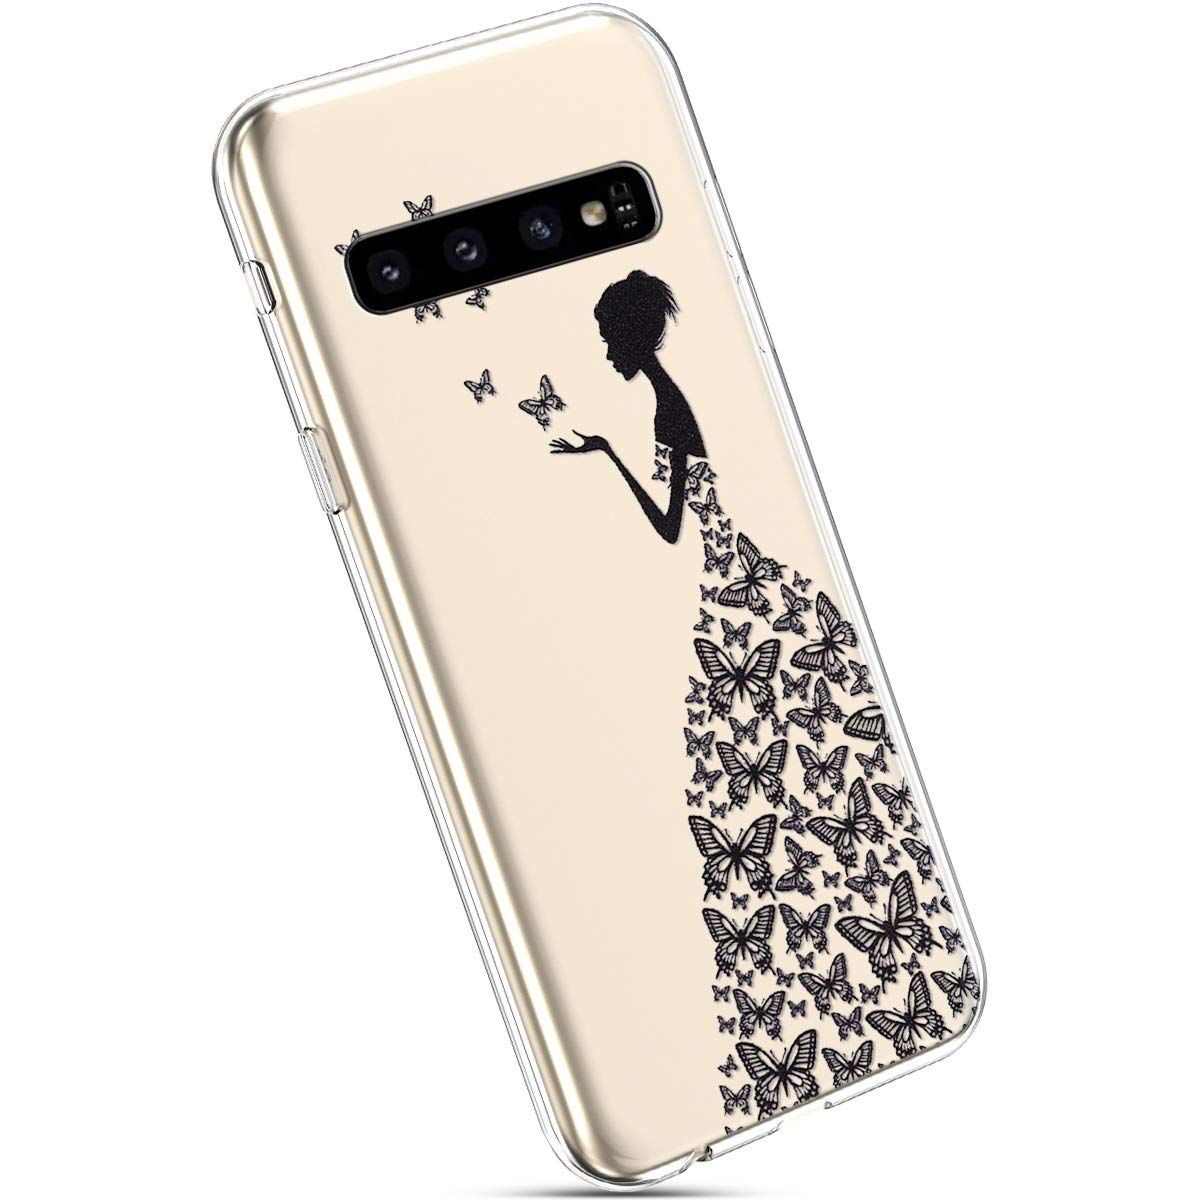 Ysimee Compatible Fundas Samsung Galaxy S10 Plus Estuches Cristal Anti-Golpes Ultra Slim Carcasa Silicona Suave Transparente Protector TPU Anti-Choque Ultra-Delgado Anti-ara/ñazos Bumper,Atrapasue/ños